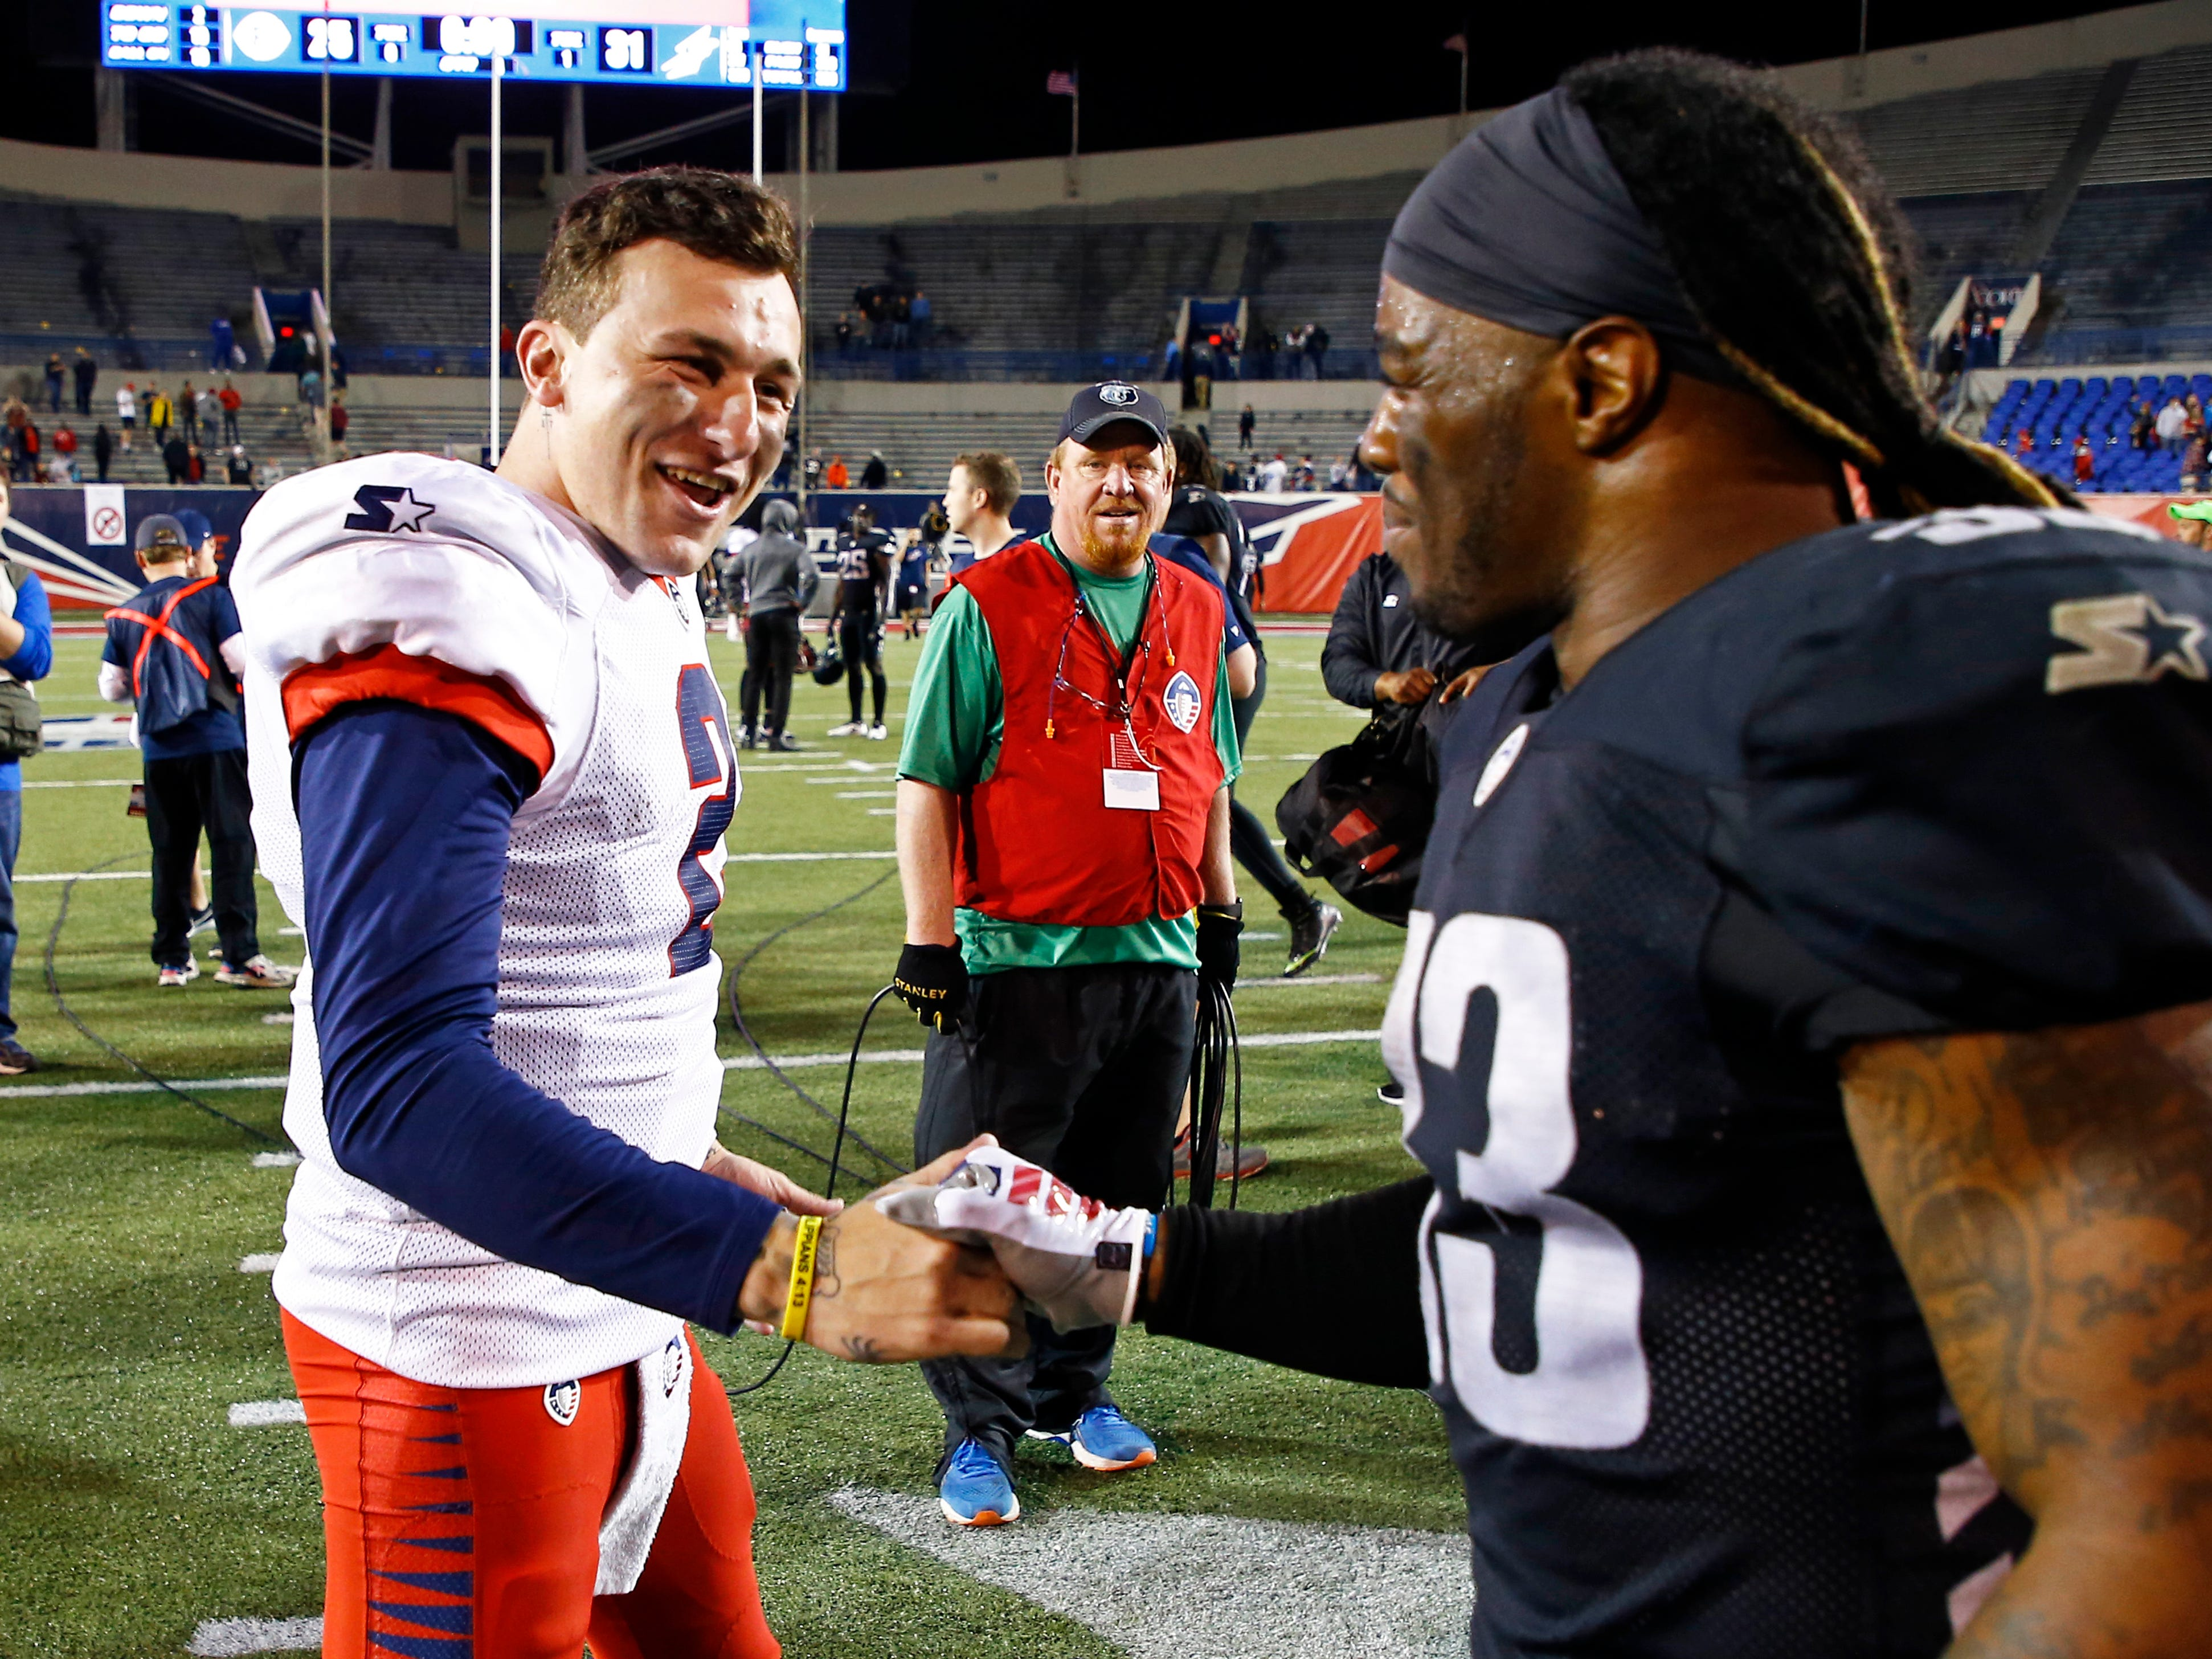 Memphis Express quarterback Johnny Manziel (2) is congratulated by Birmingham Iron running back Trent Richardson (33) after a Birmingham Iron at Memphis Express AAF football game, Sunday, March 24, 2019, at Liberty Bowl Memorial Stadium in Memphis.